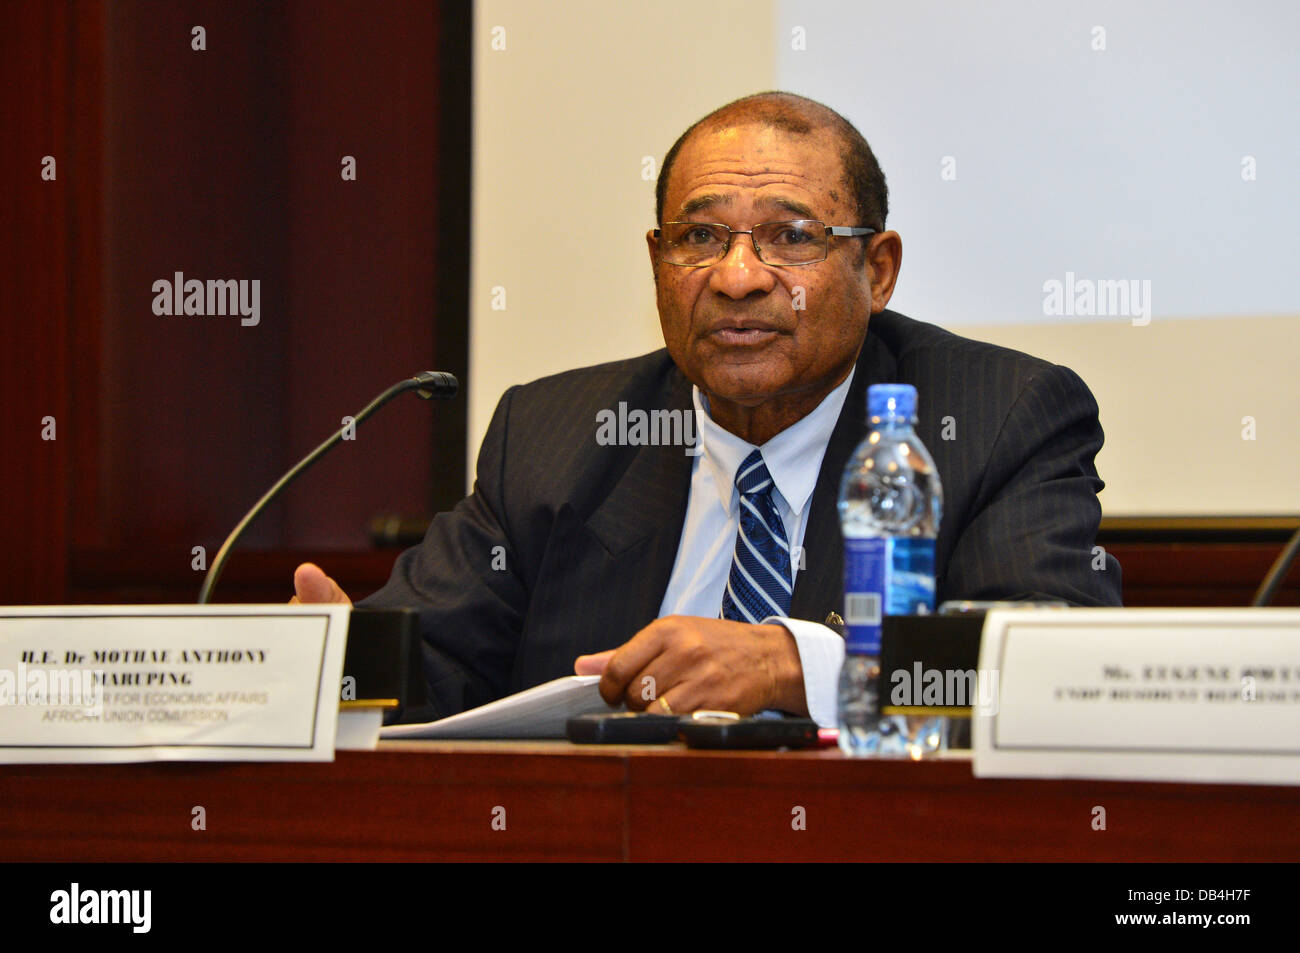 Dr Mothae Anthony Maruping, Commissioner for Economic Affairs, African Union Commission (AU), Addis Ababa, Ethiopia - Stock Image